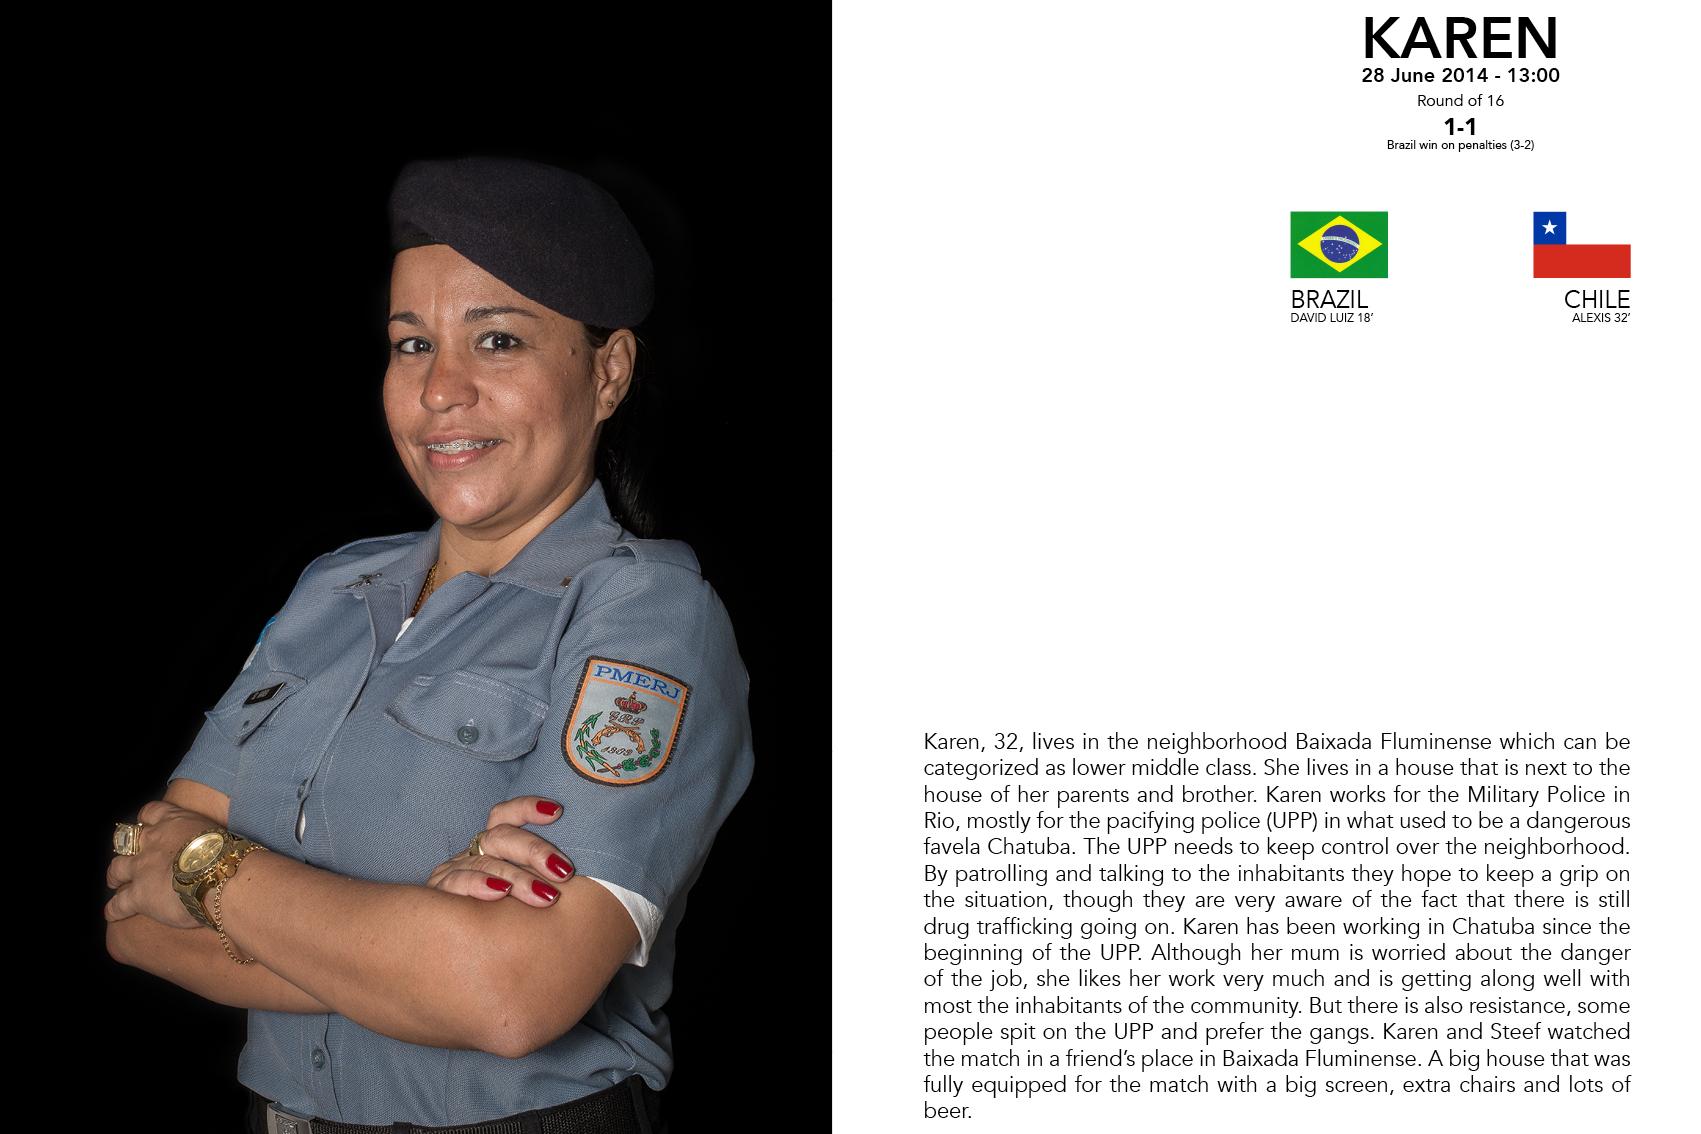 THE OTHER SELEÇãO Pages5.jpg